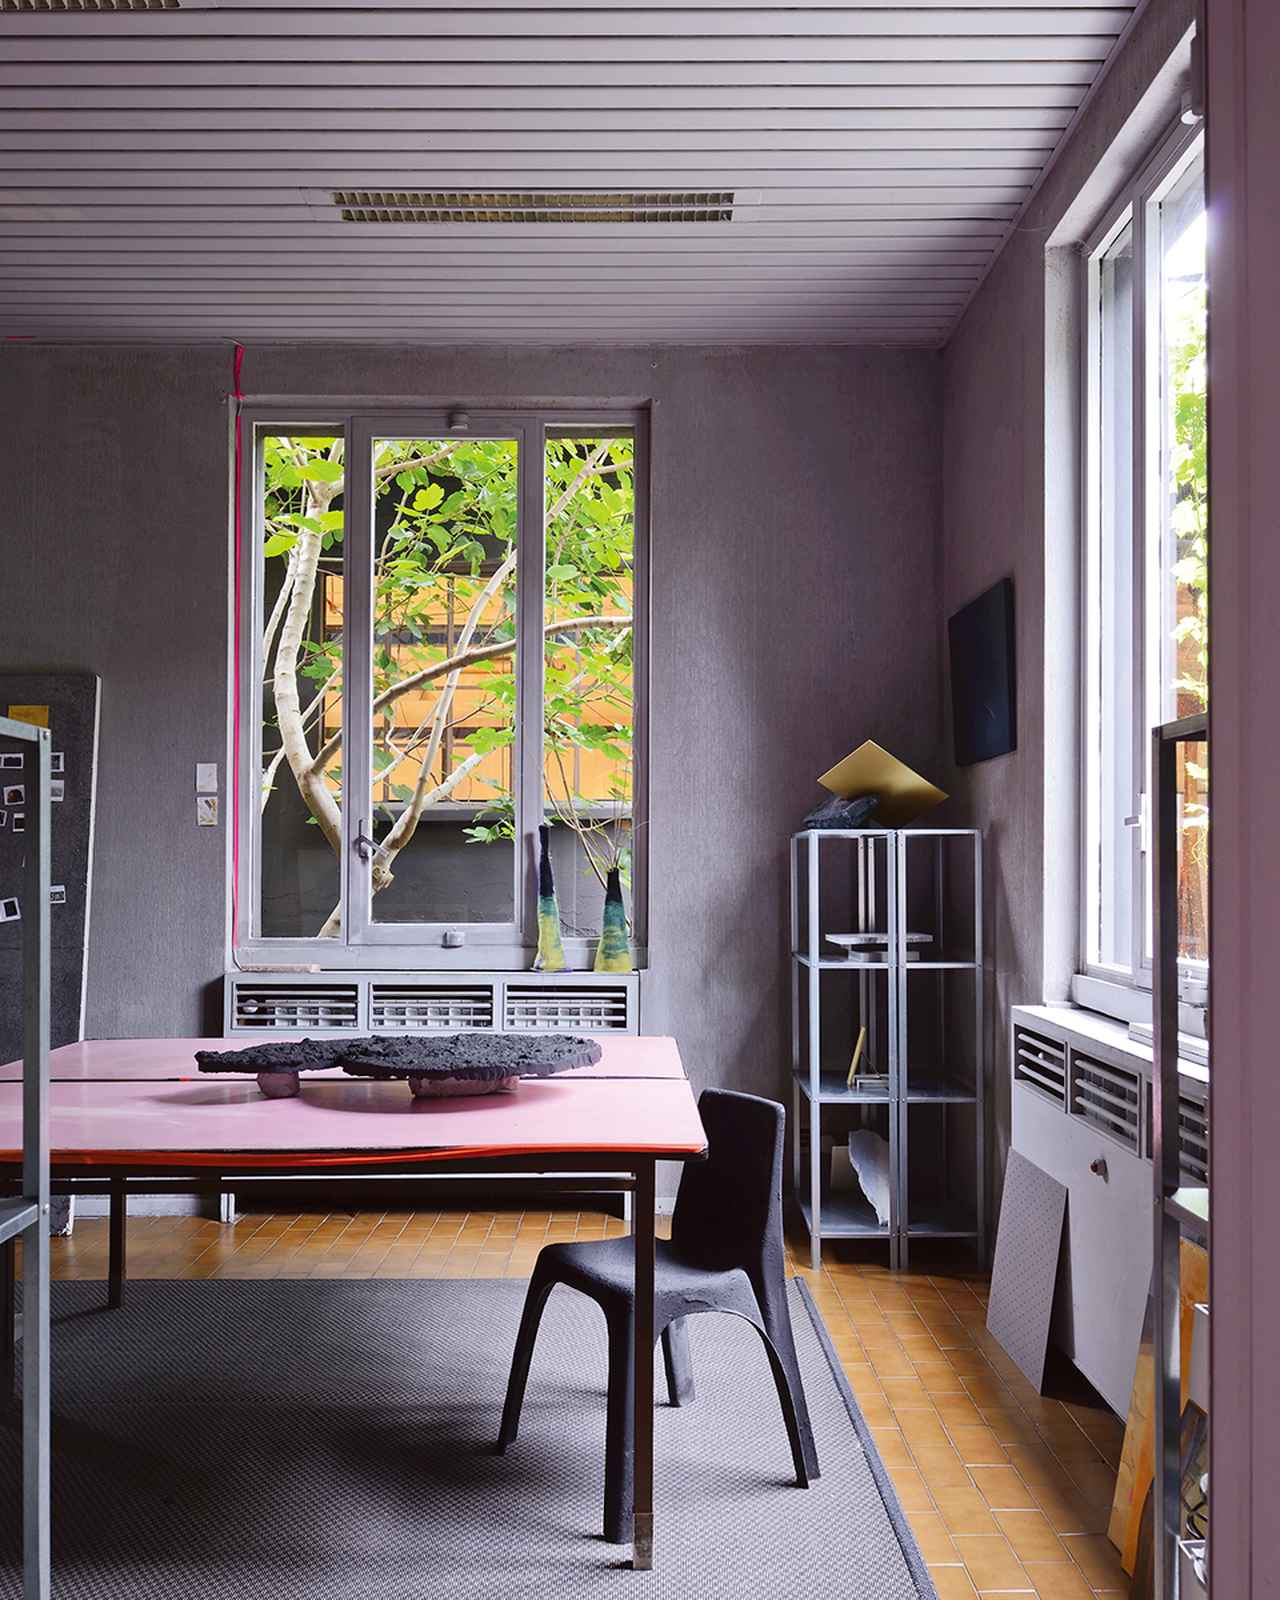 Images : 3番目の画像 - 「建築家トニョンが試みる 実験的な住まいのかたち」のアルバム - T JAPAN:The New York Times Style Magazine 公式サイト